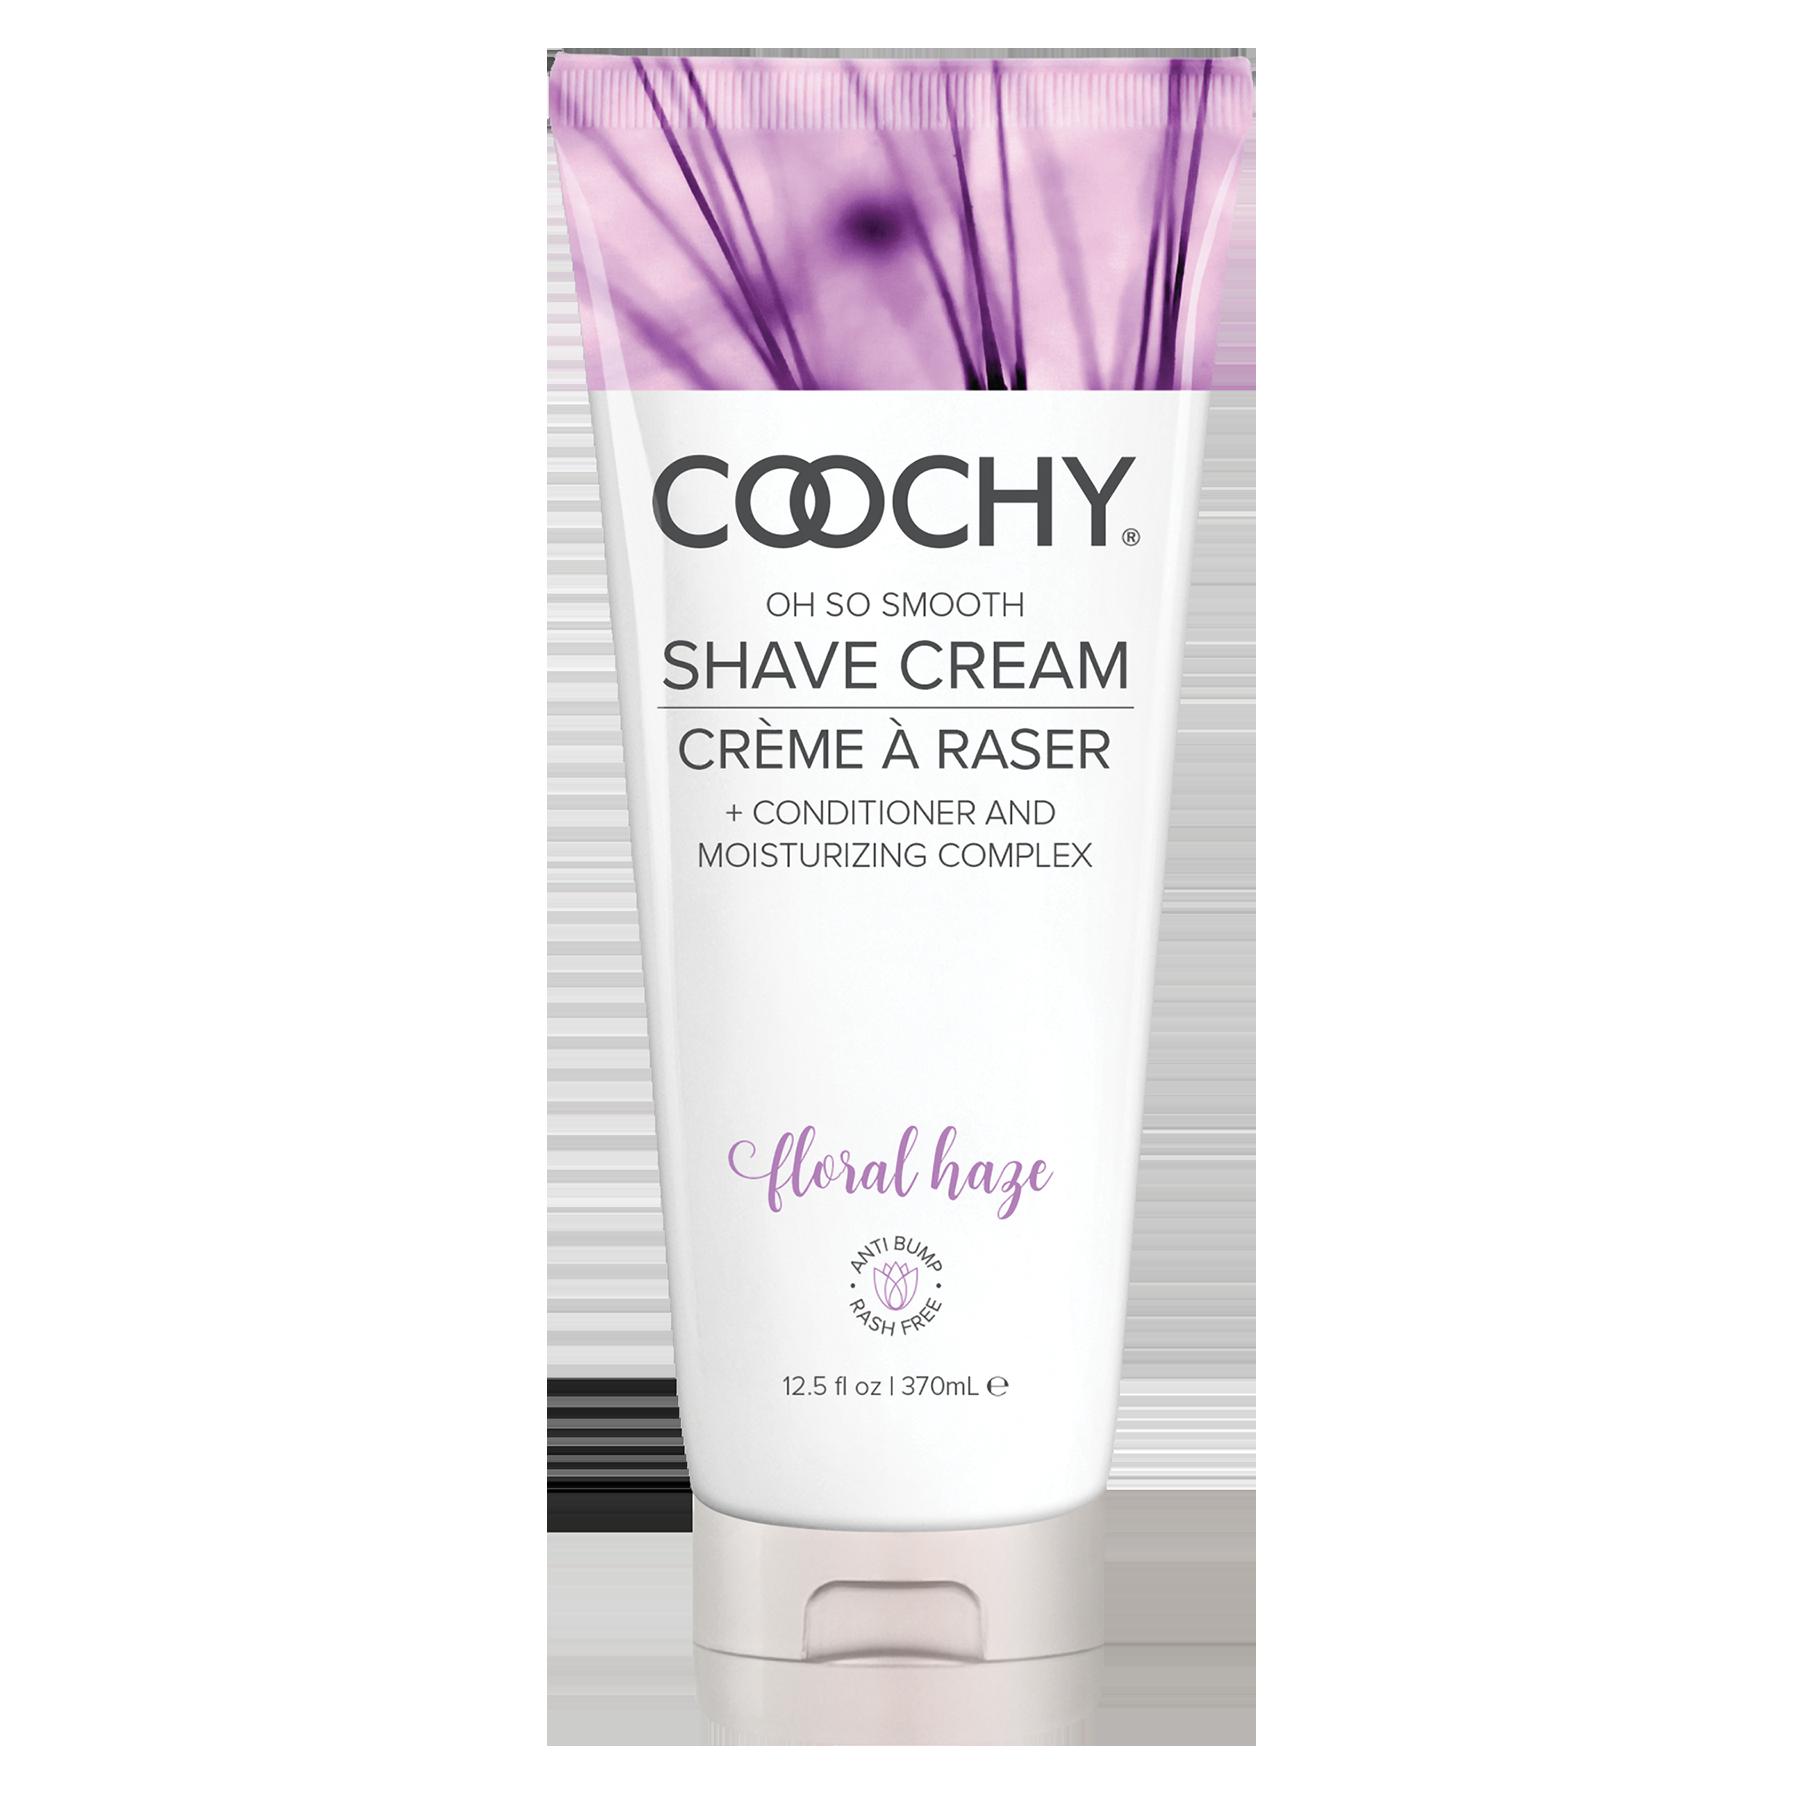 COOCHY SHAVE CREAM FLORAL HAZE 12.5 OZ